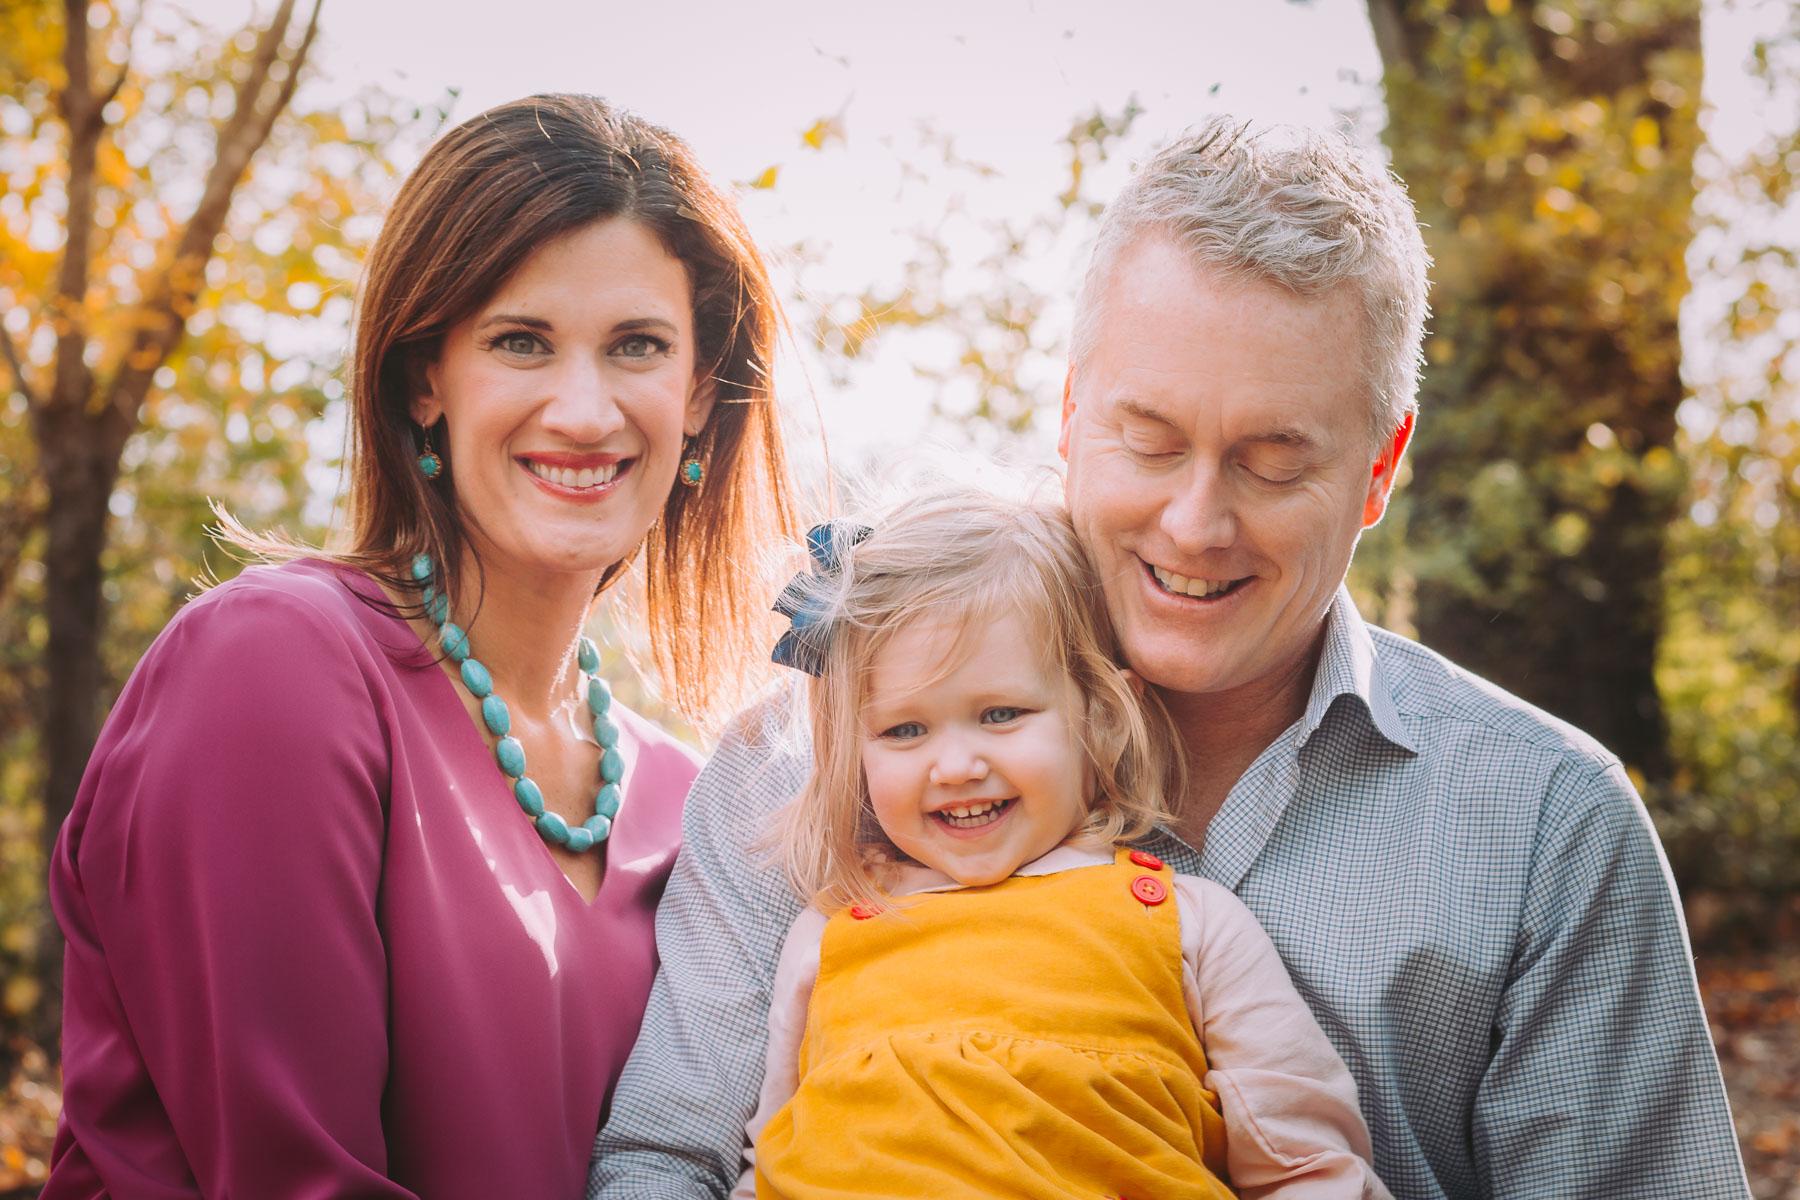 duncanfamily_lo_res-28.jpg